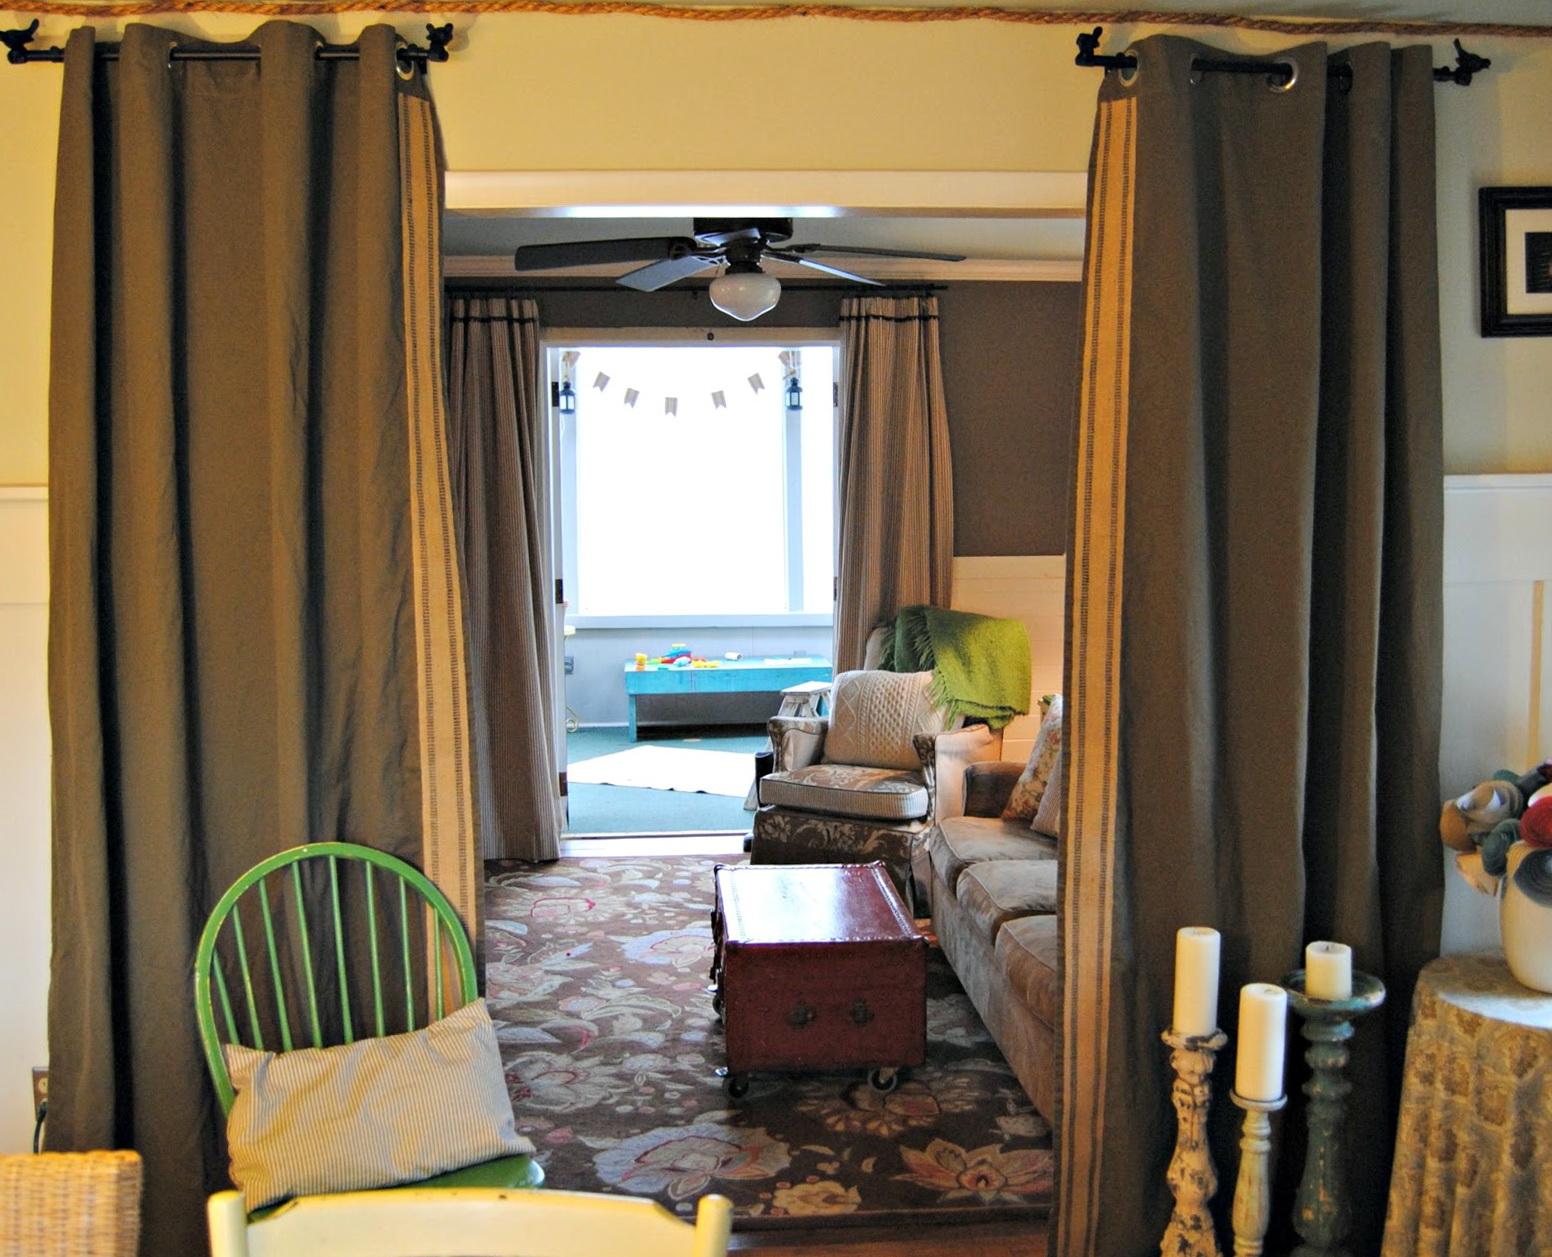 Ikea Curtain Panels Ideas Home Design Ideas